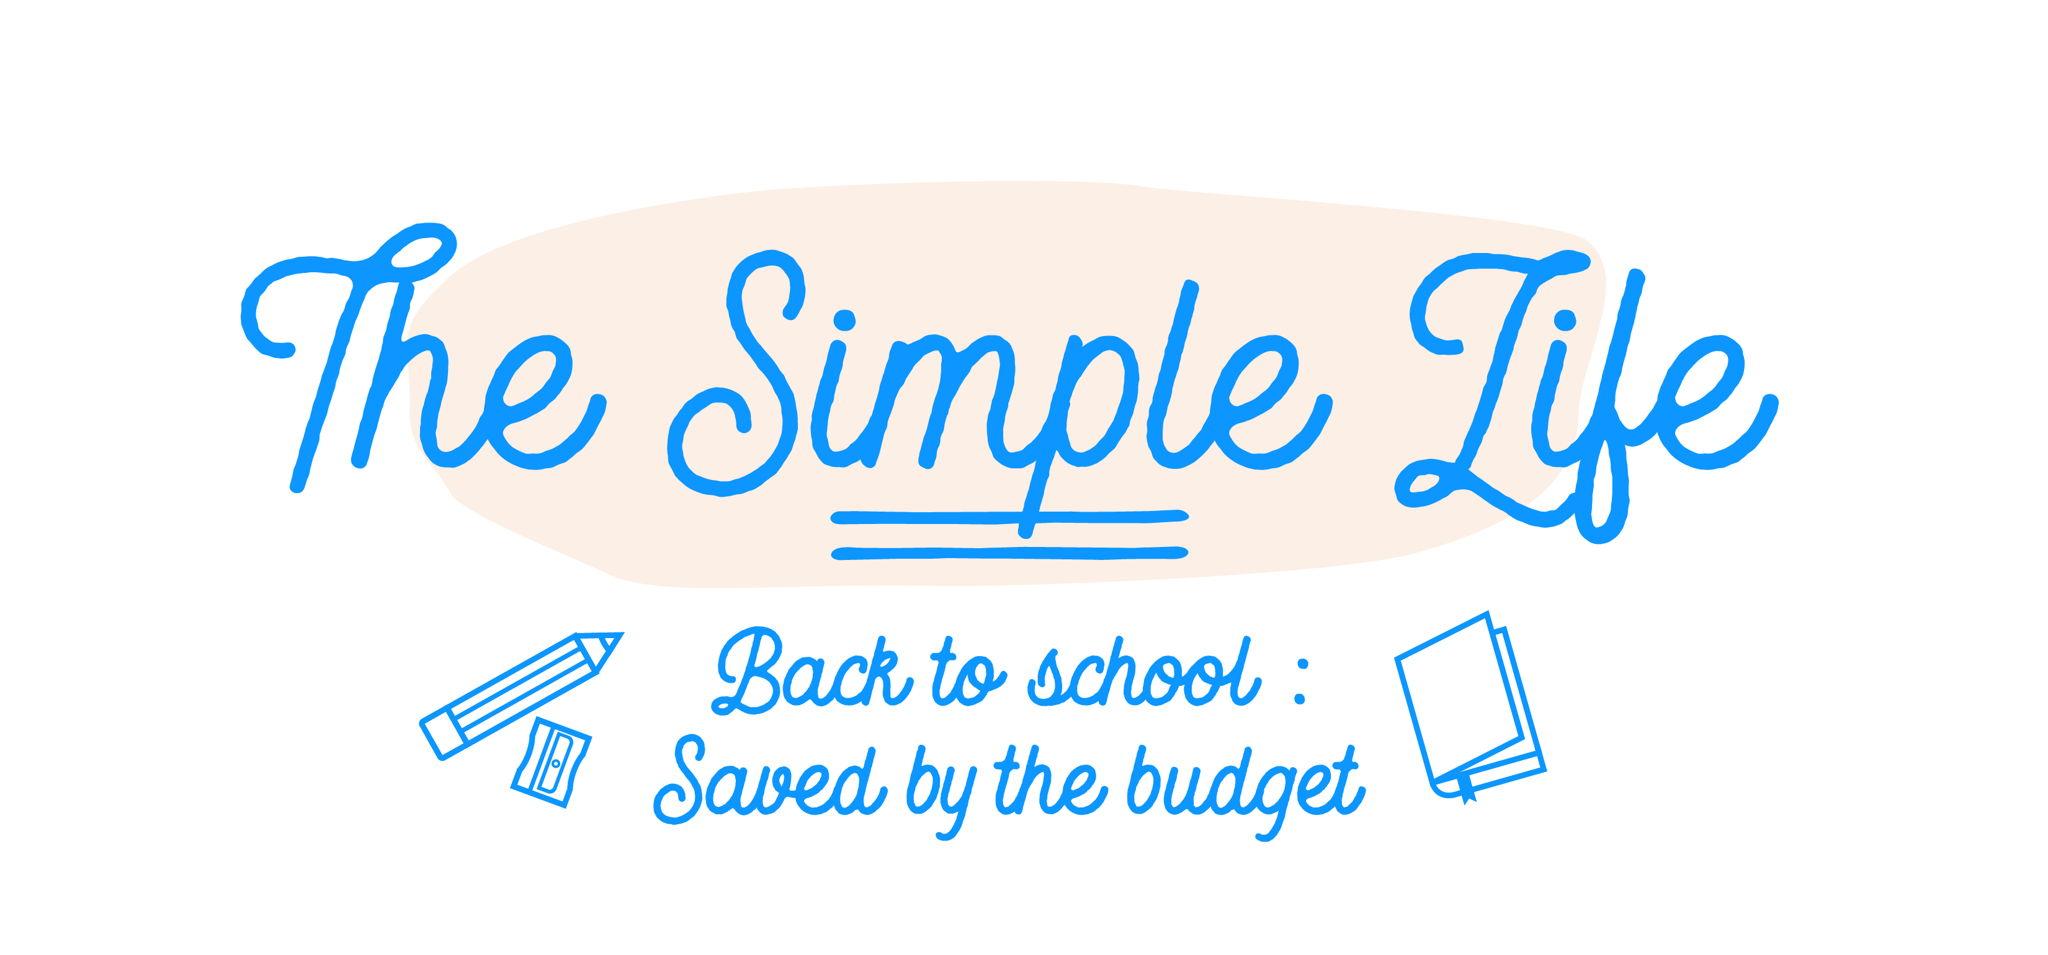 The Simple Life - Celebrate Good Savings, C'mon!